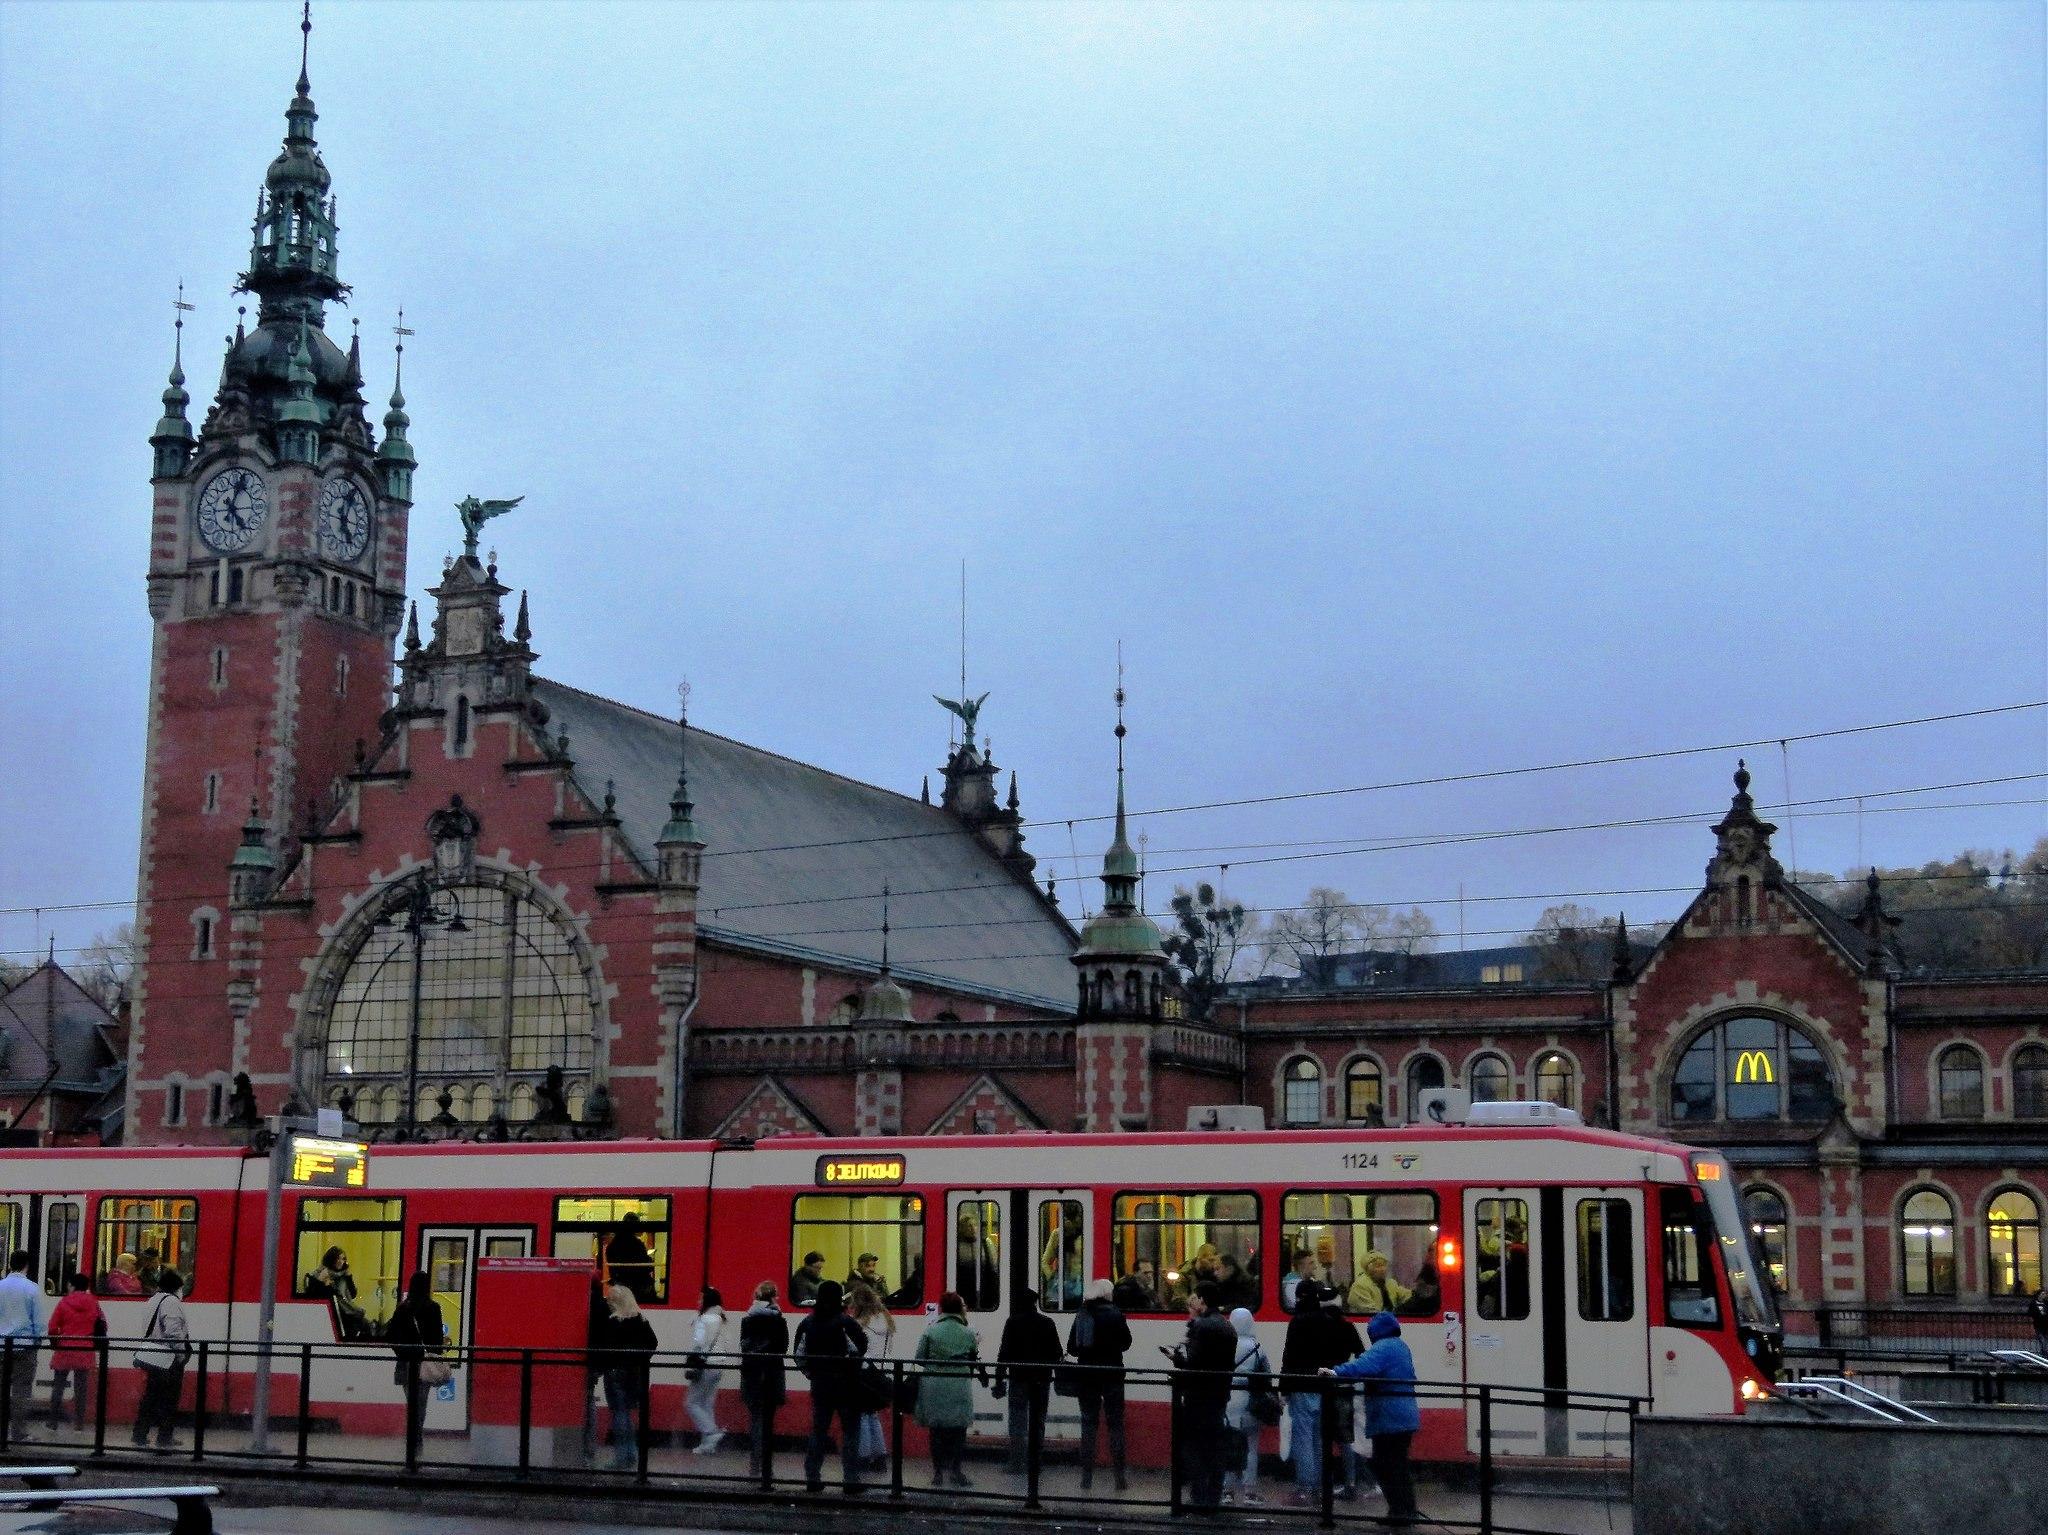 Gdansk Tram and Railroad Station